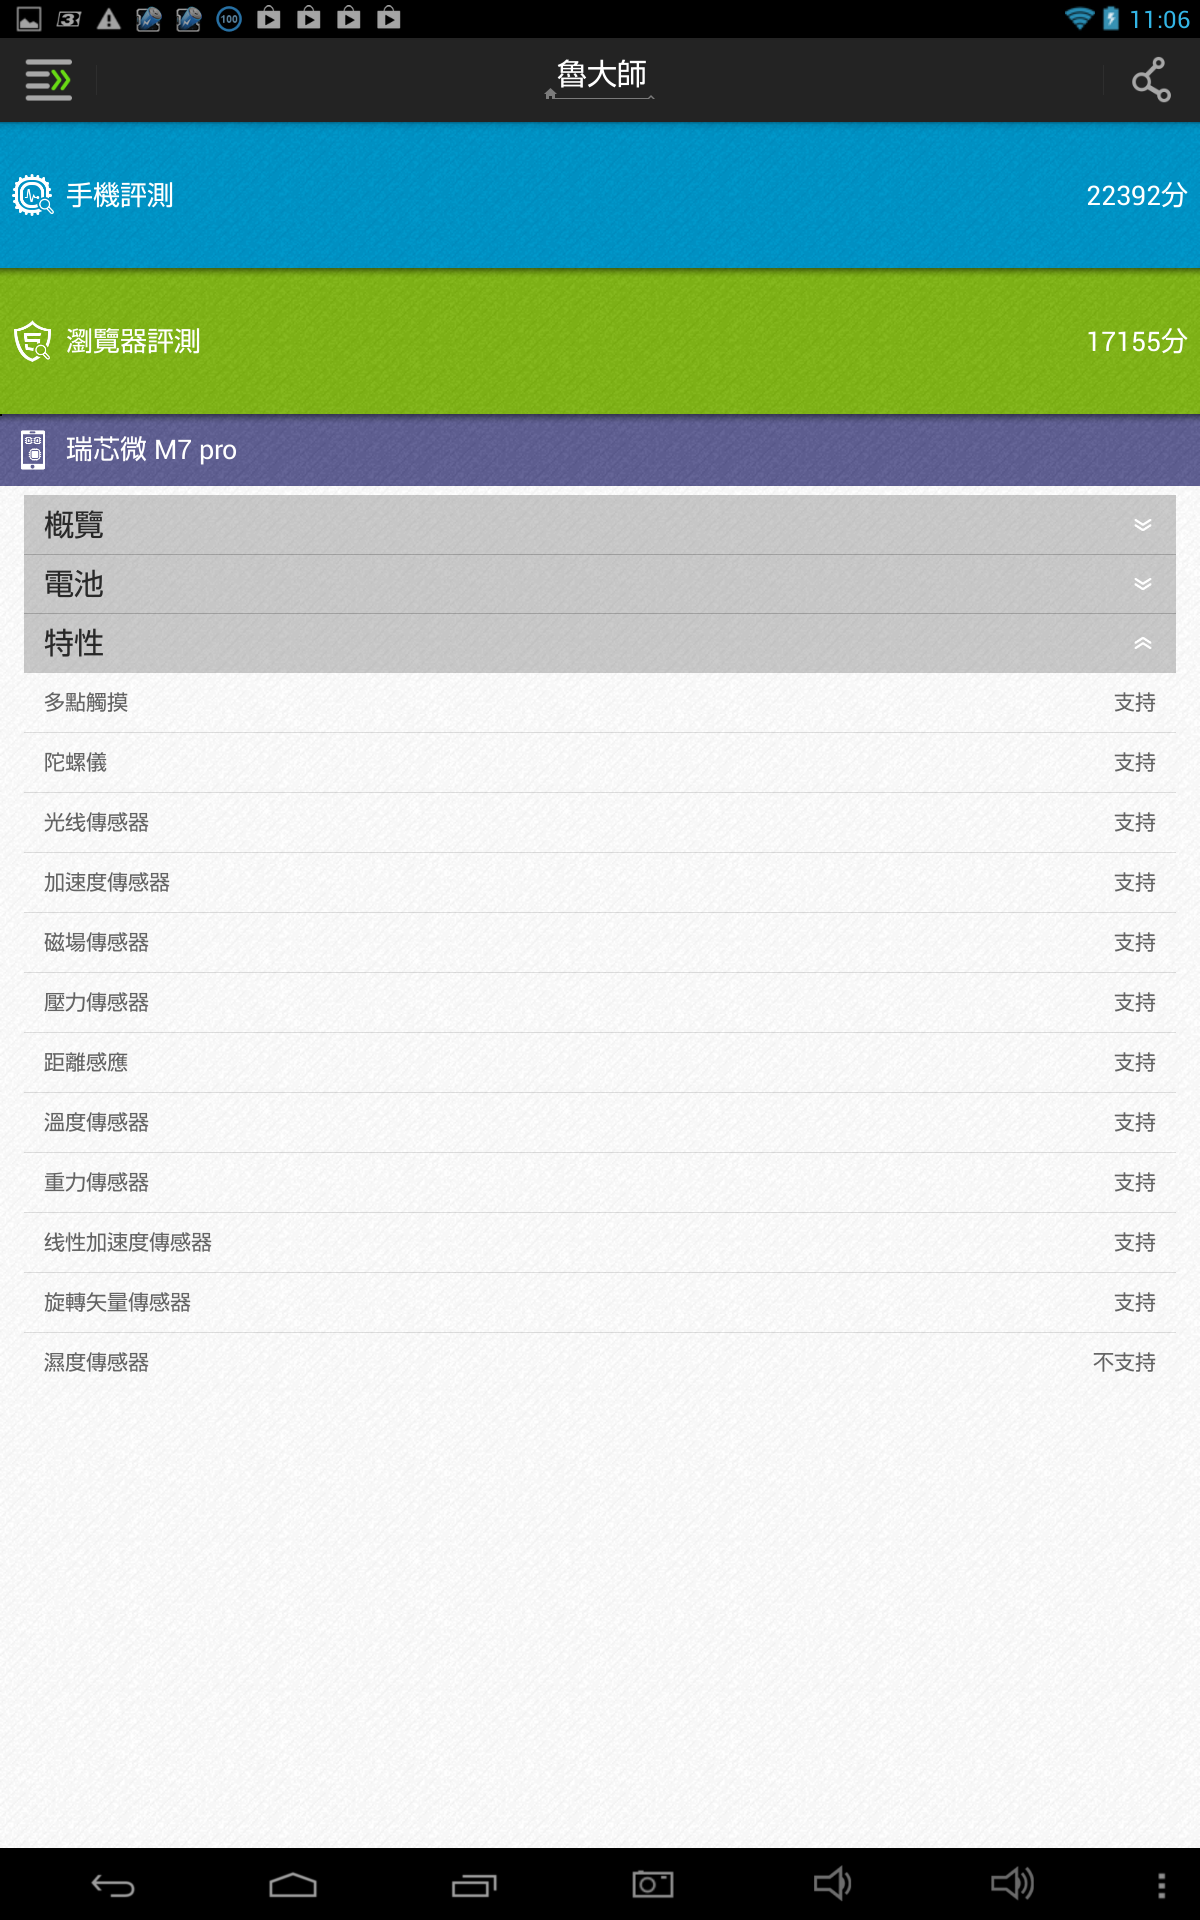 Screenshot_2013-08-07-11-06-49.png